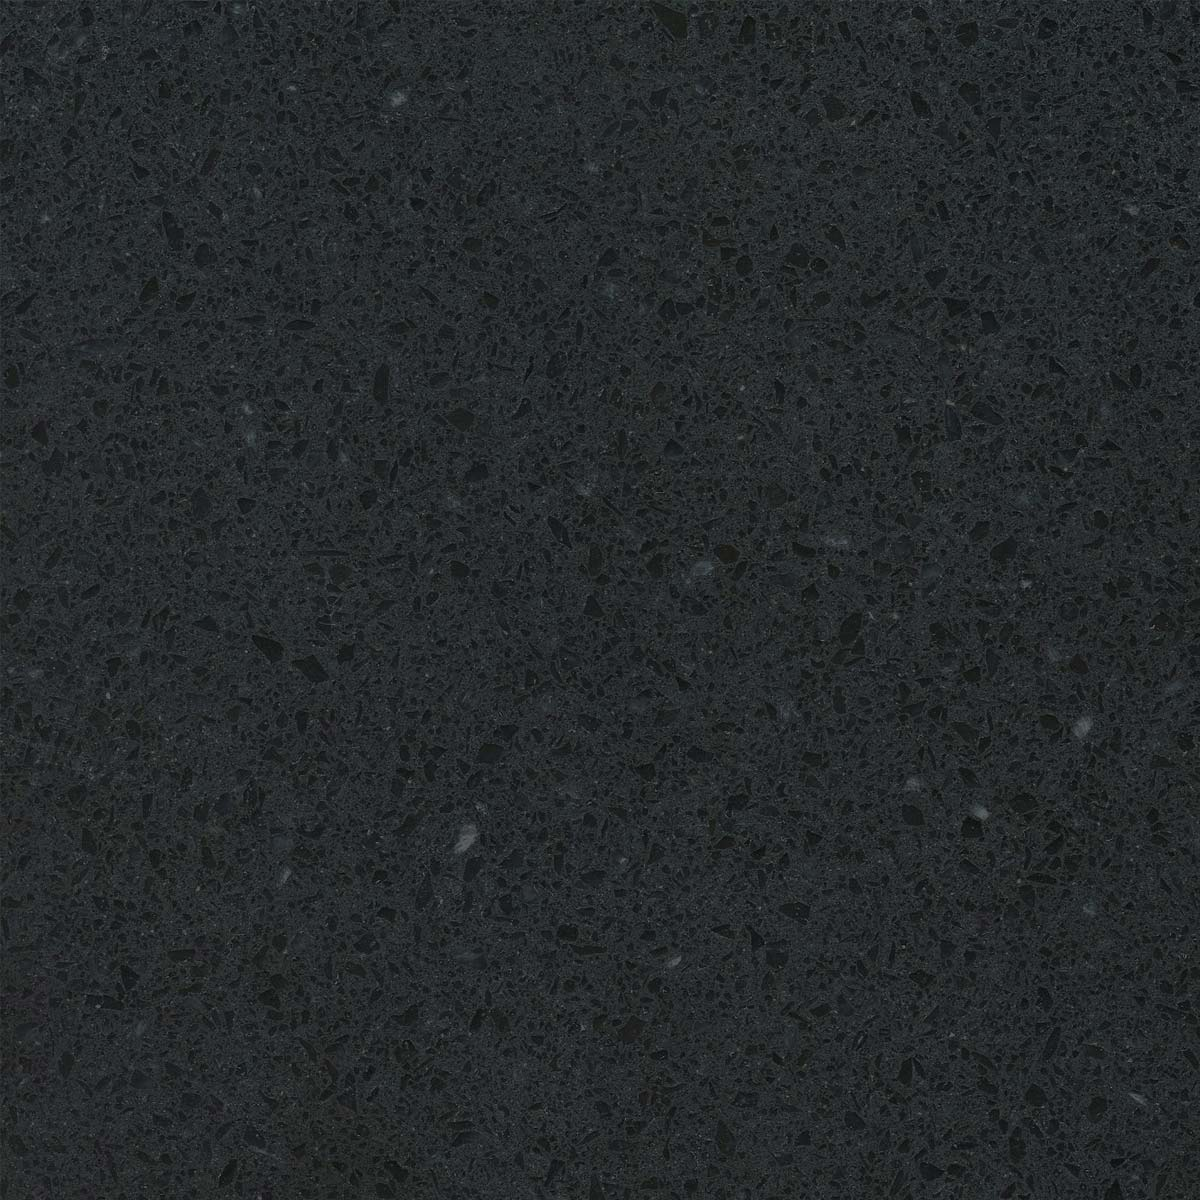 Silestone-Negro-Anubis-abastel